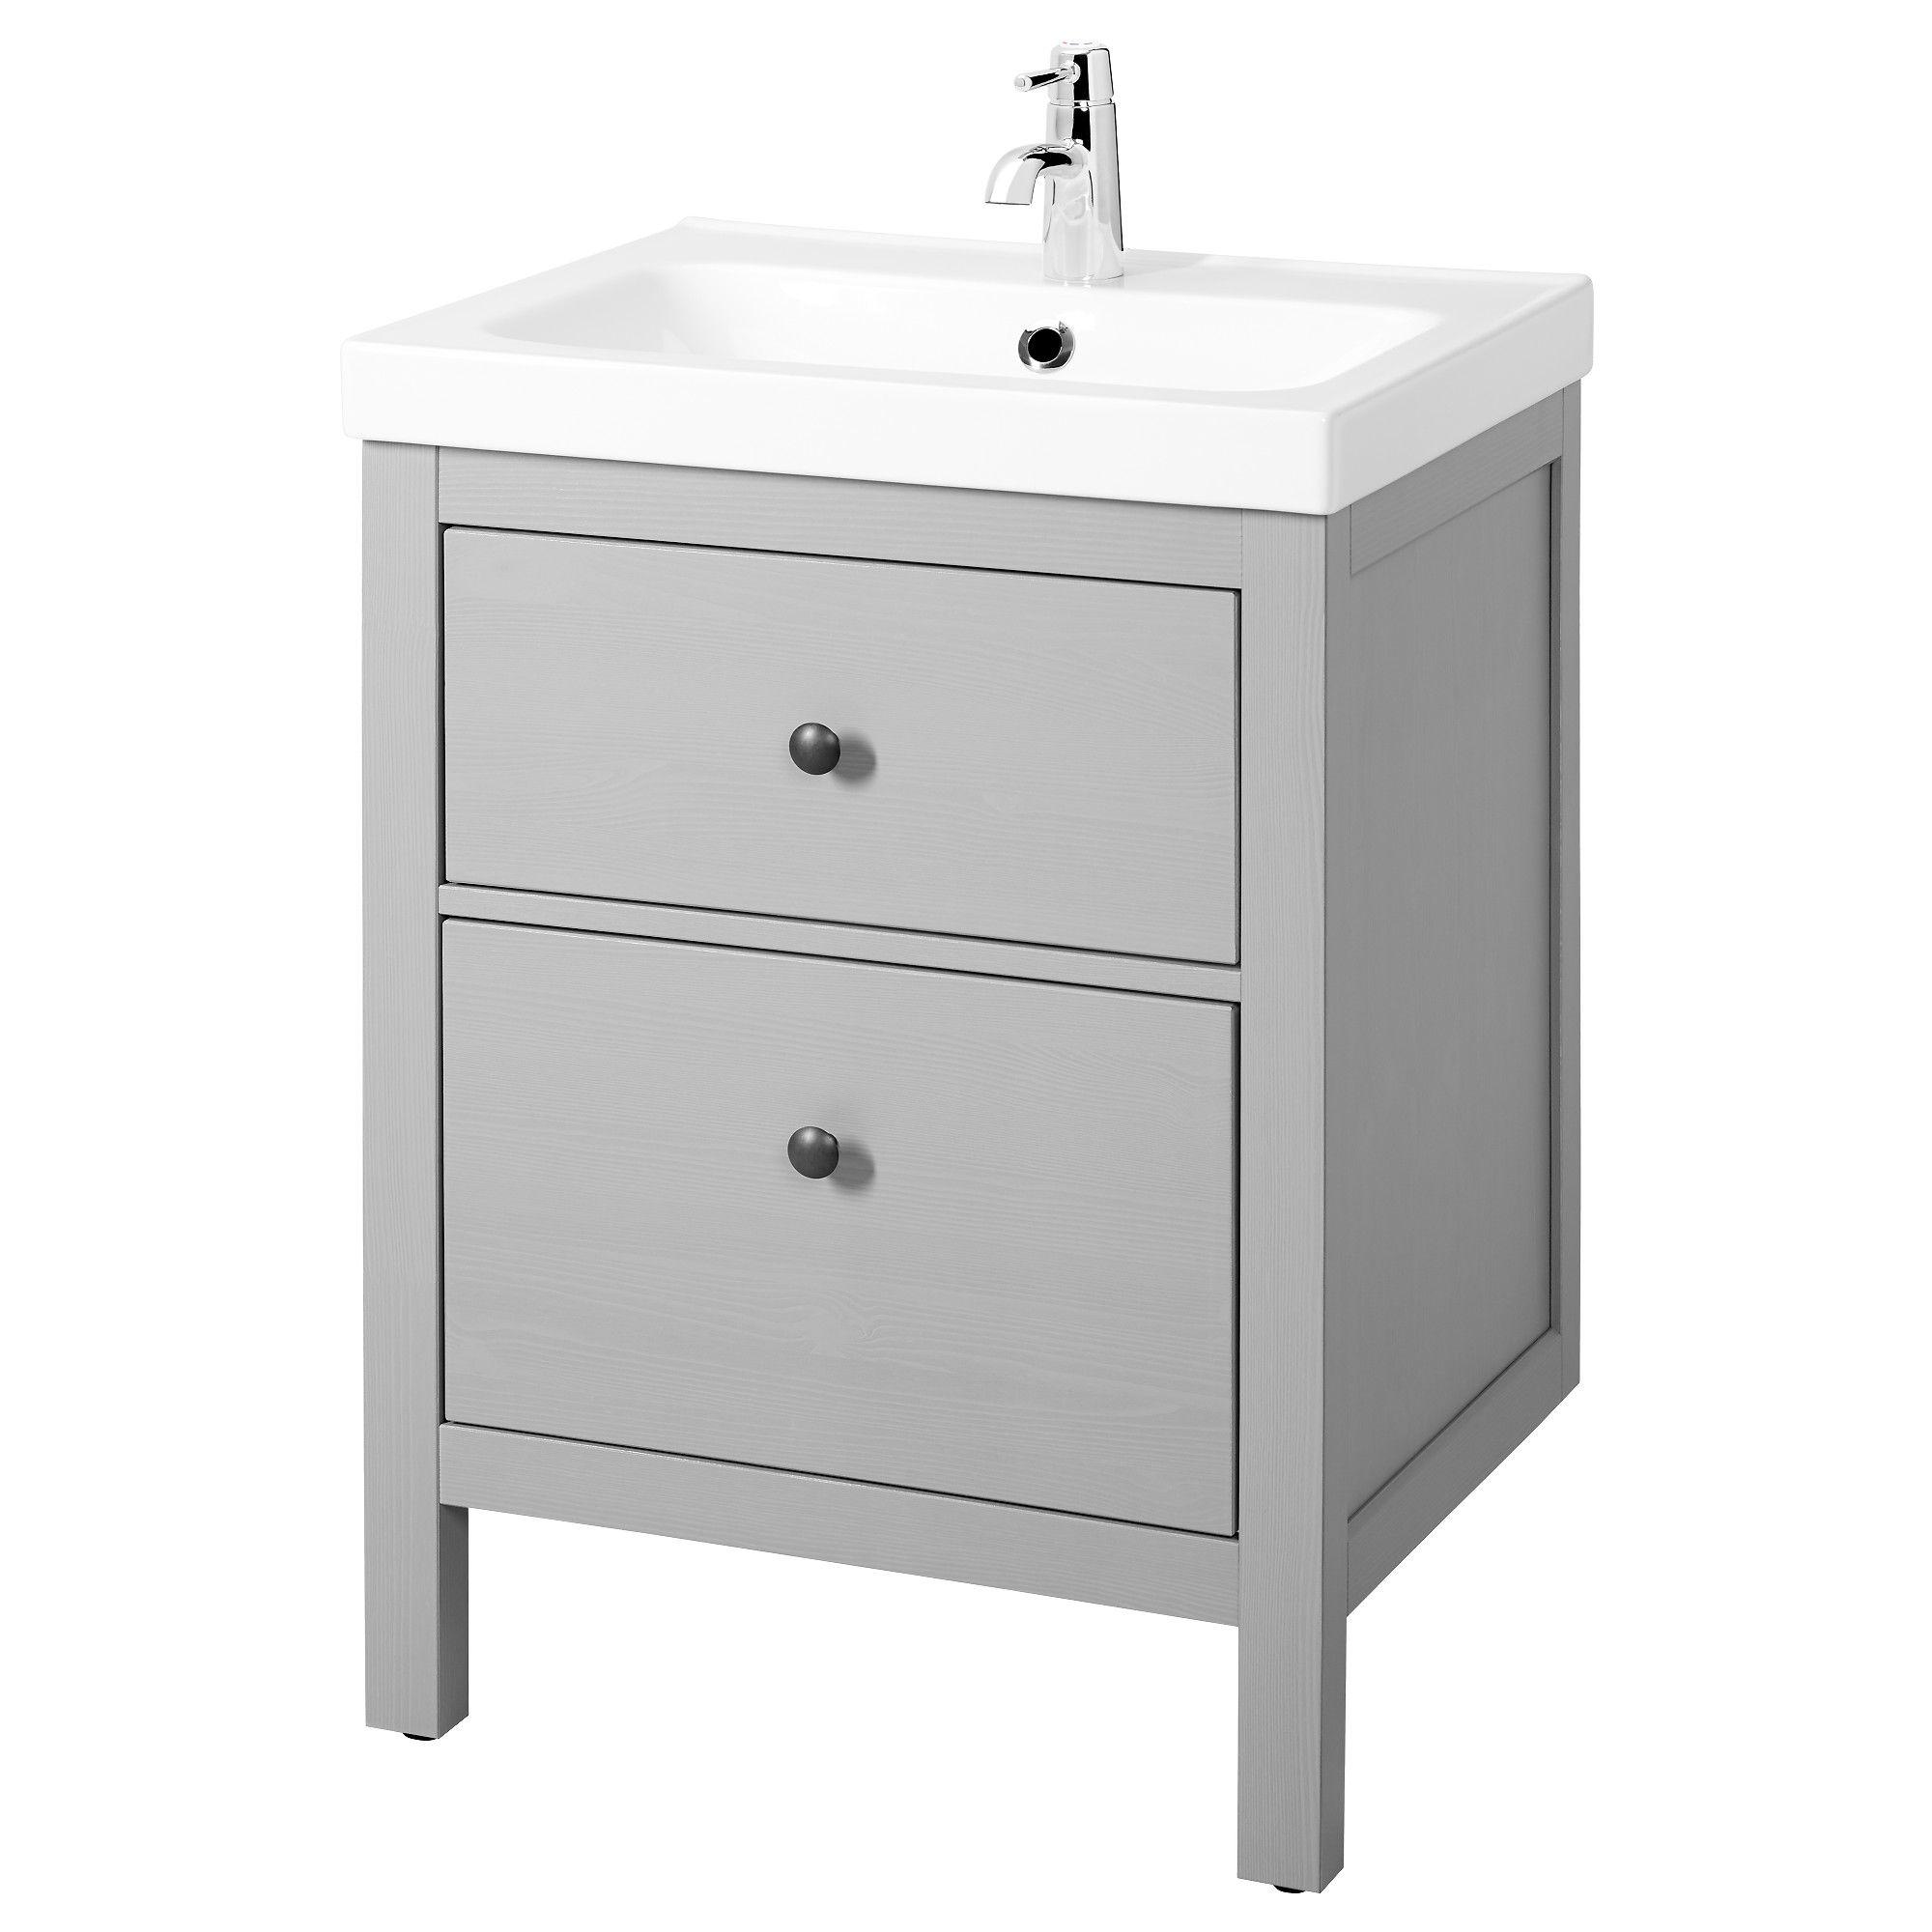 IKEA - HEMNES / ODENSVIK Sink cabinet with 2 drawers gray | Powder ...